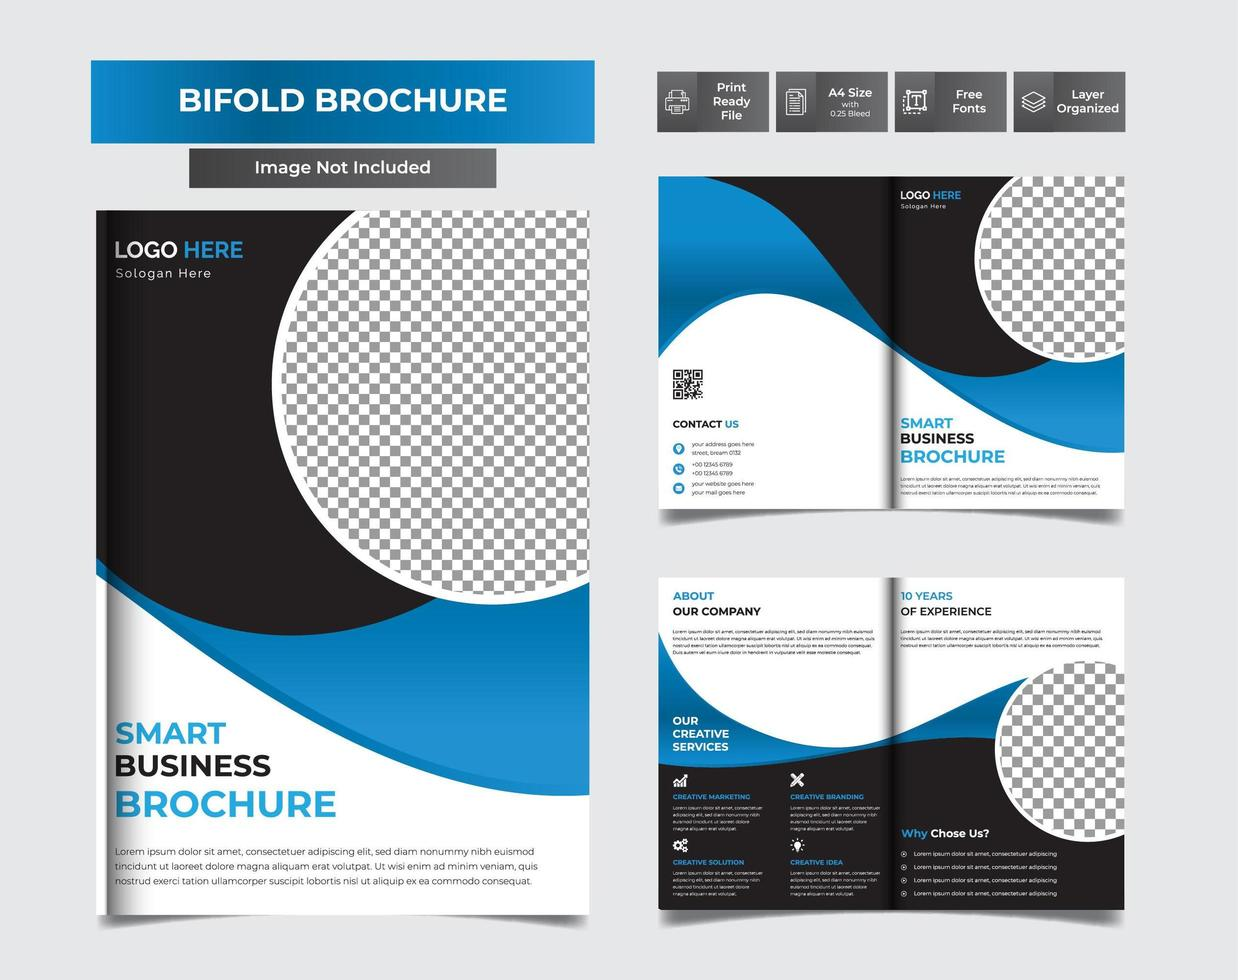 Kreis moderne Business zweifache Broschüre vektor